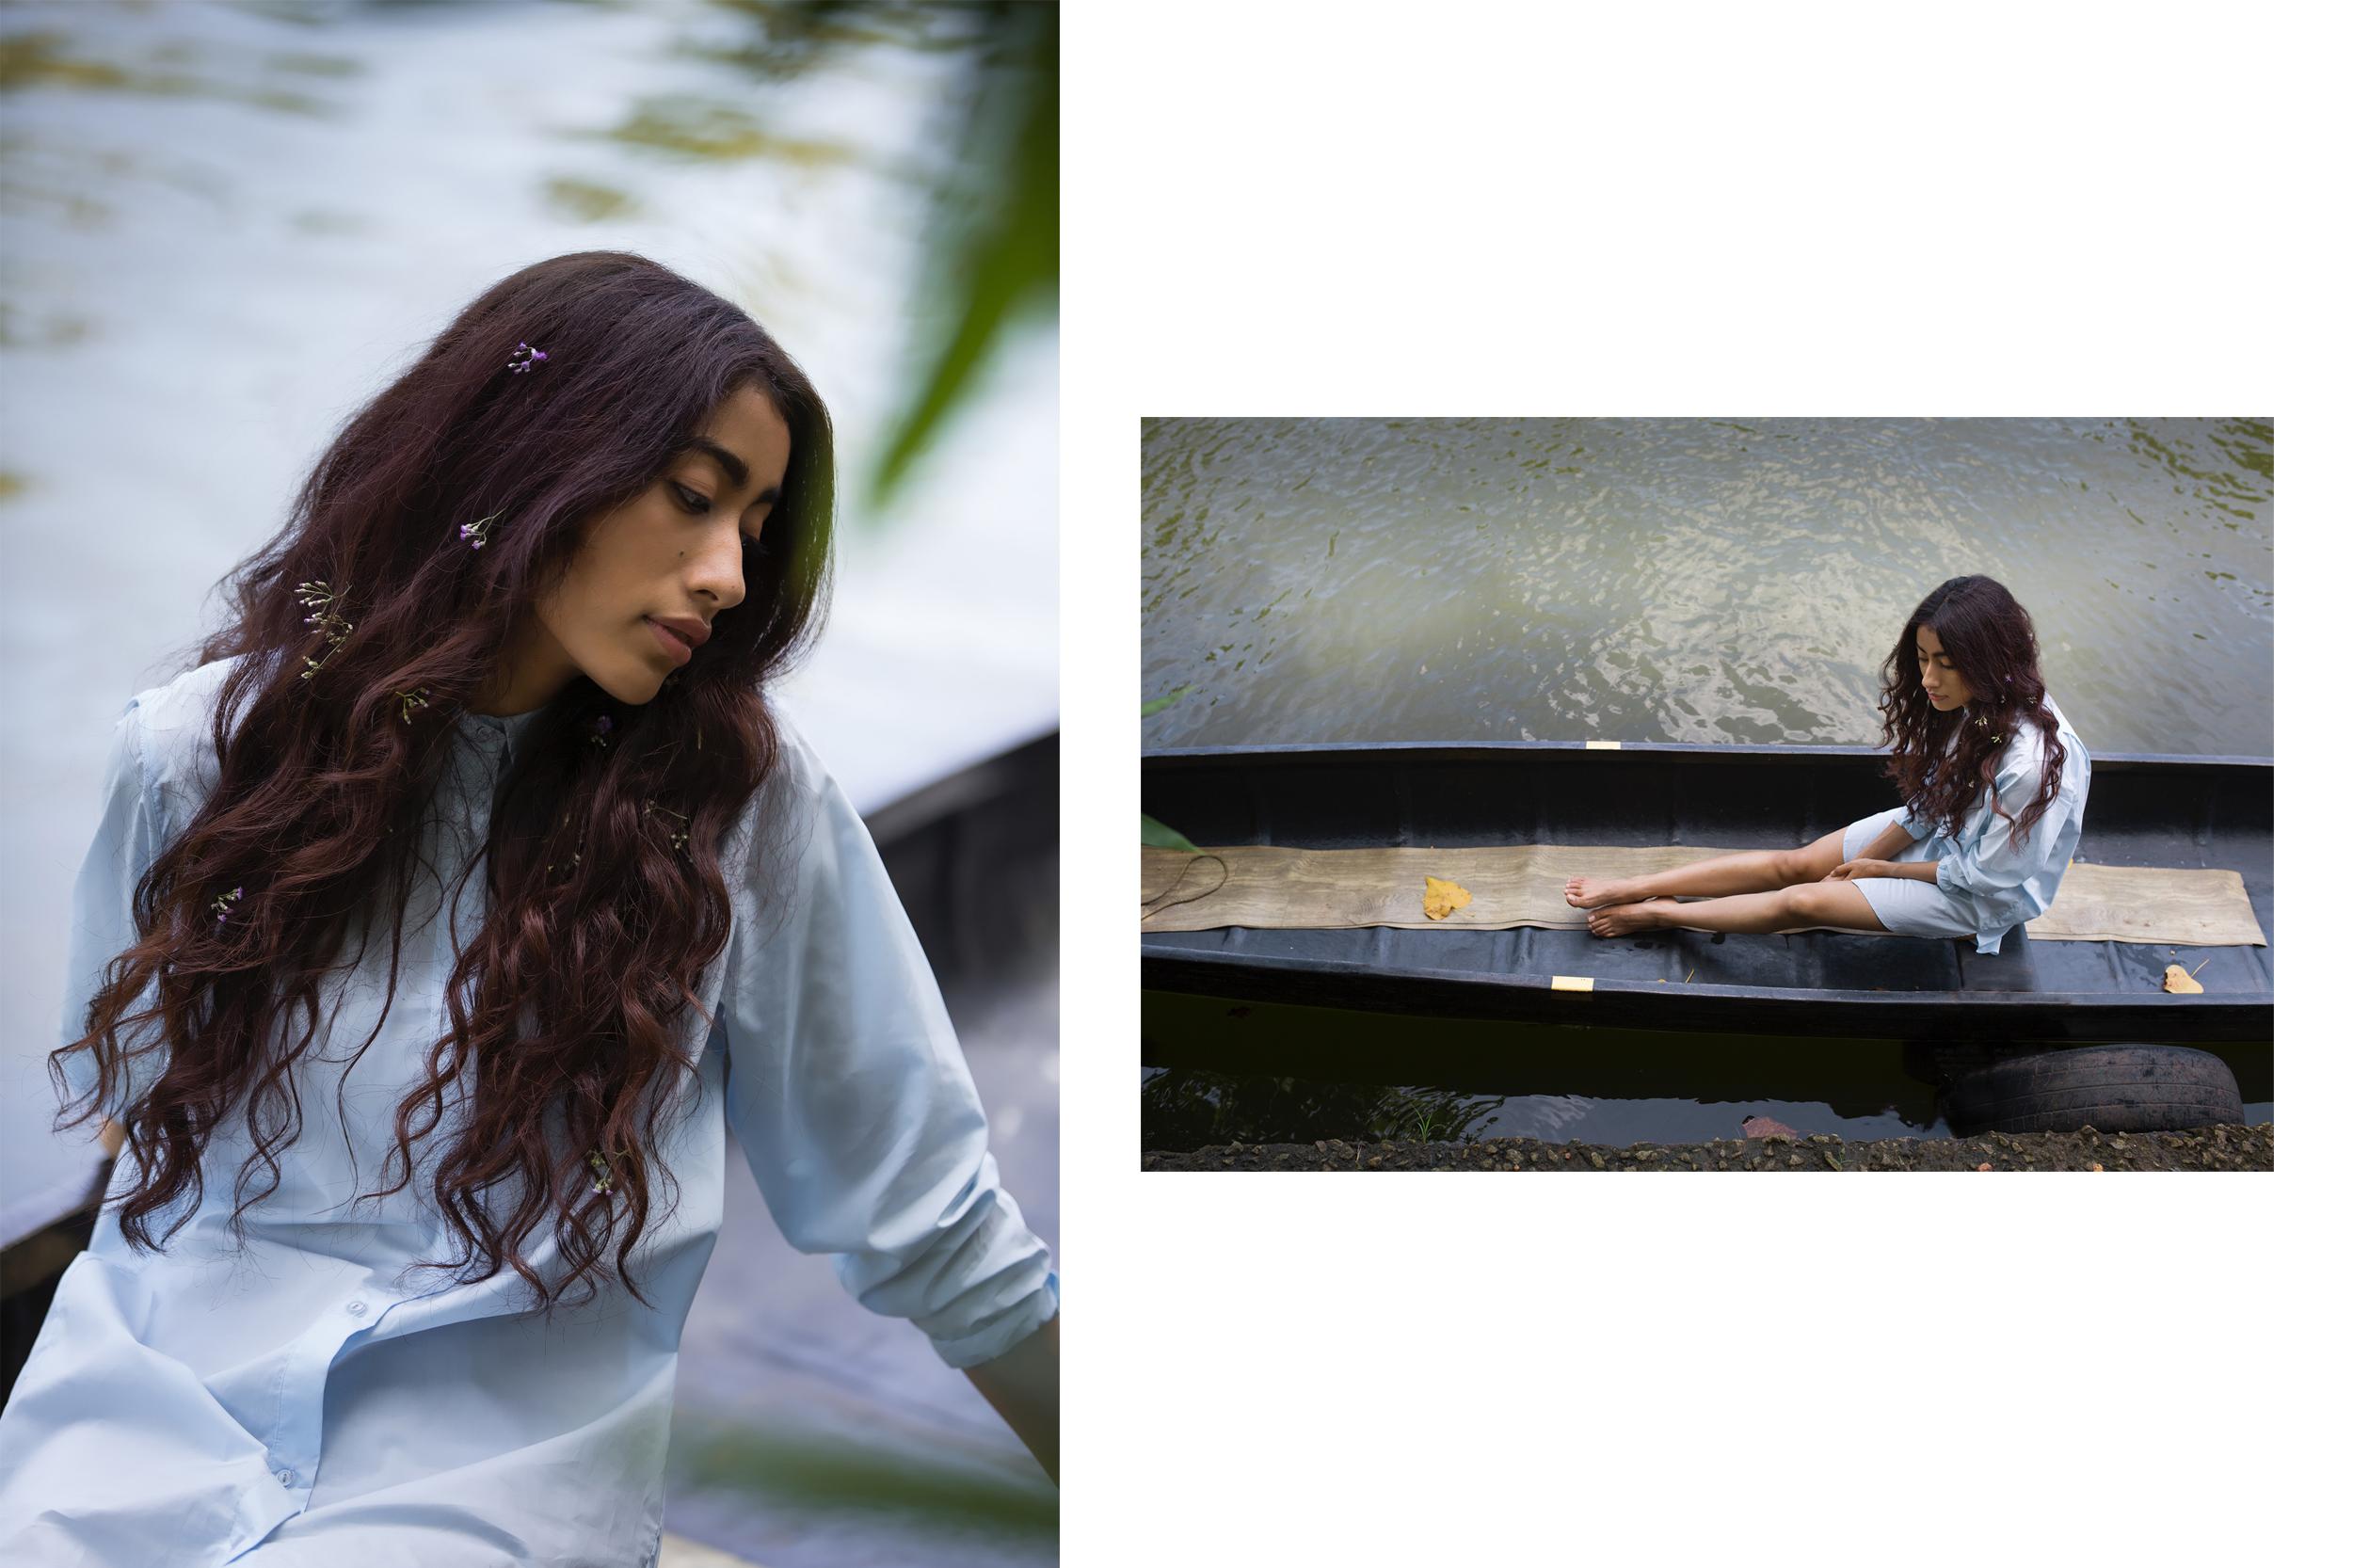 Sindhur_Photography_Fashion_Gloria tep_14.jpg